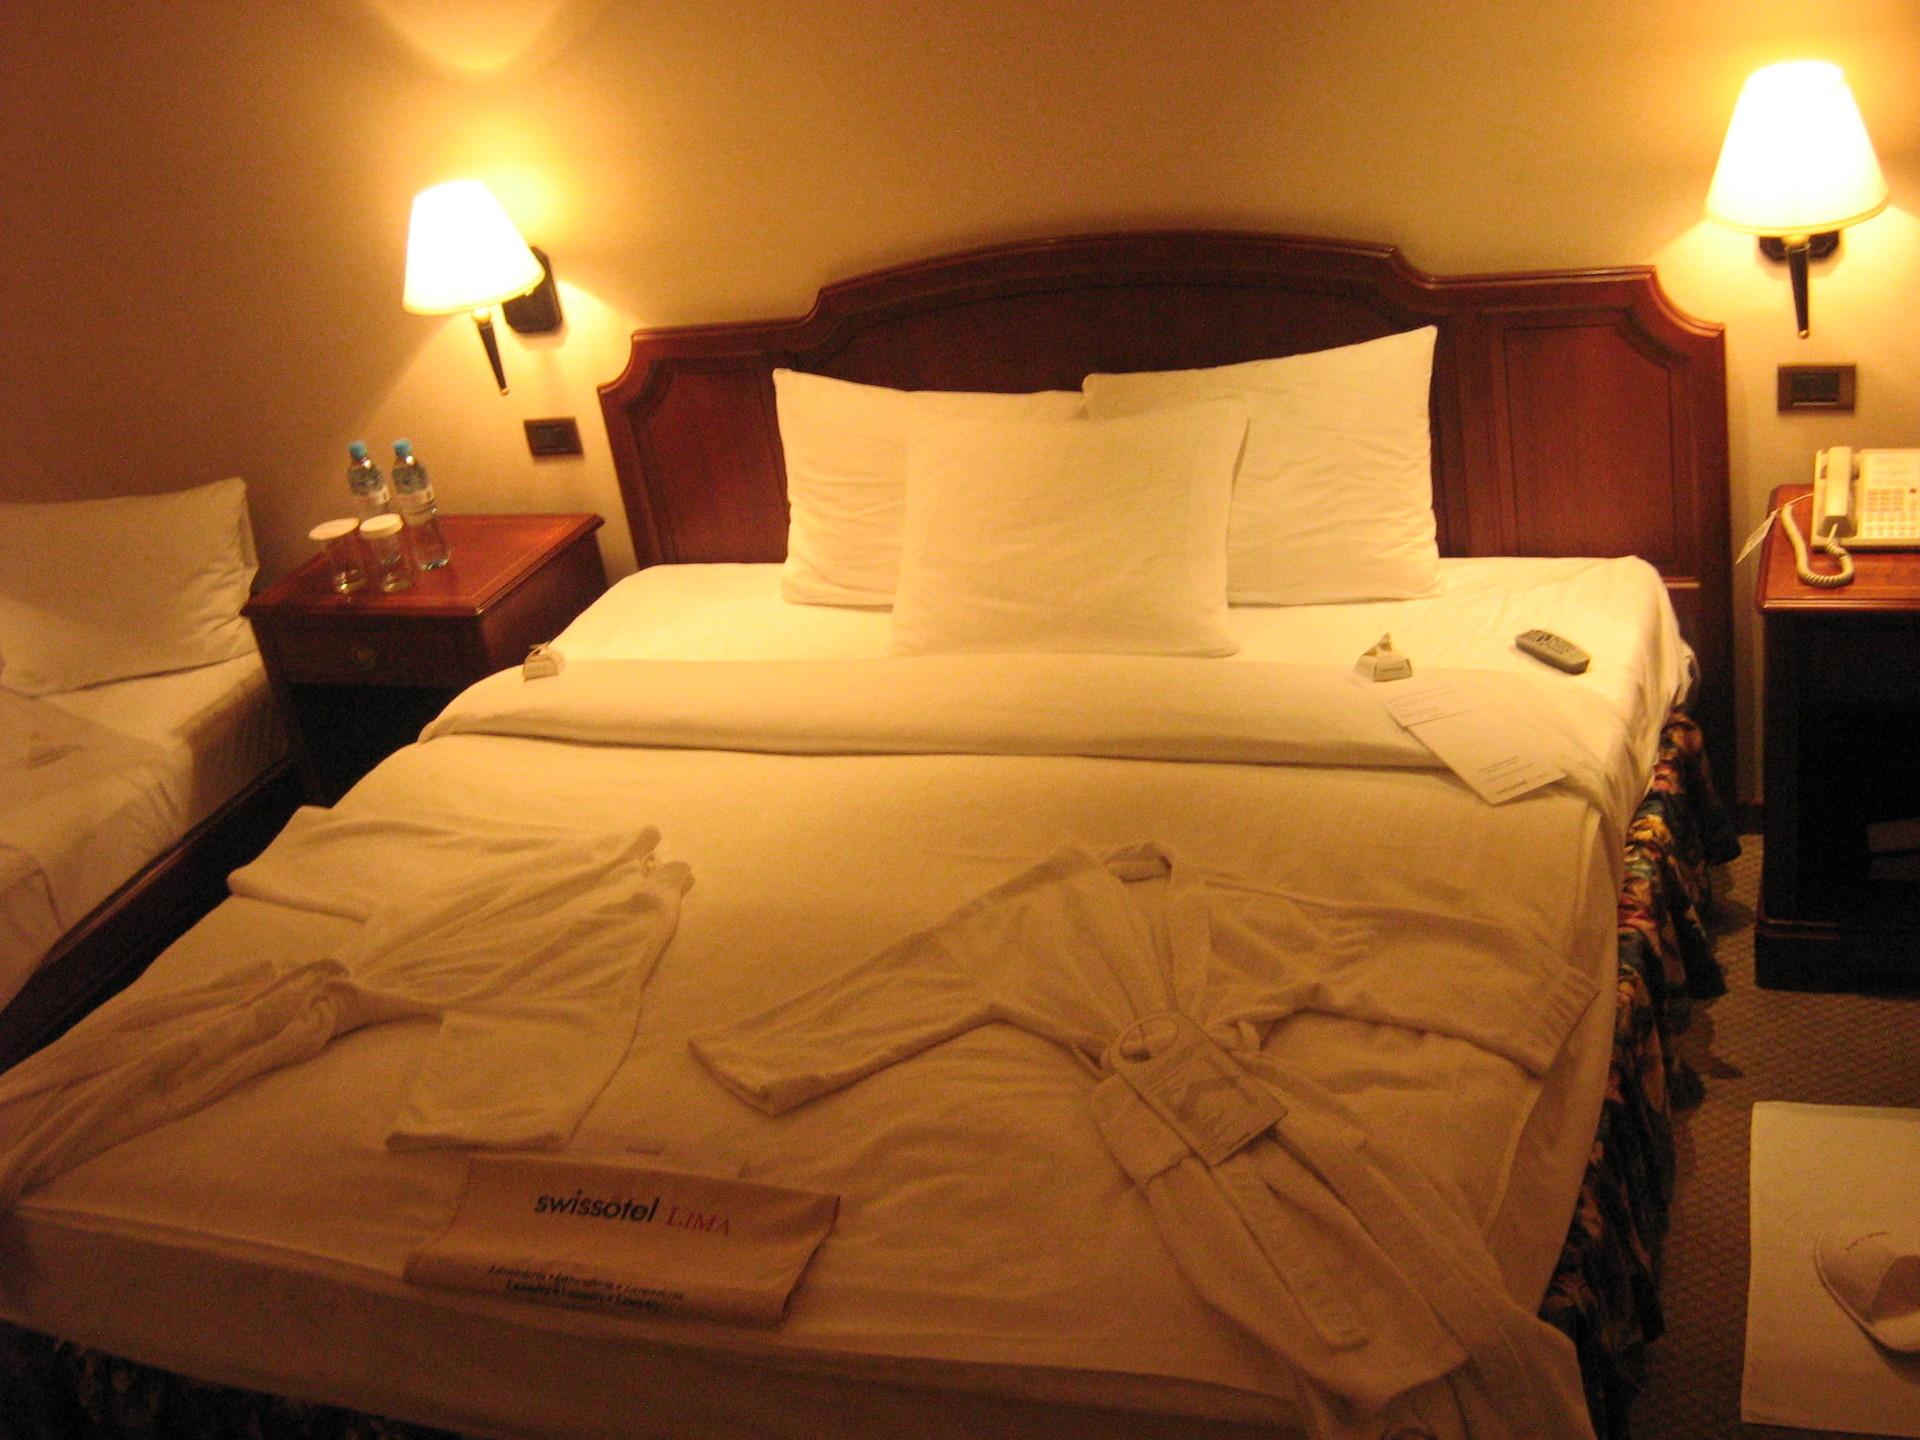 Swissotel Lima, mi primera experiencia hotelera   Blog Erasmus Lima ...